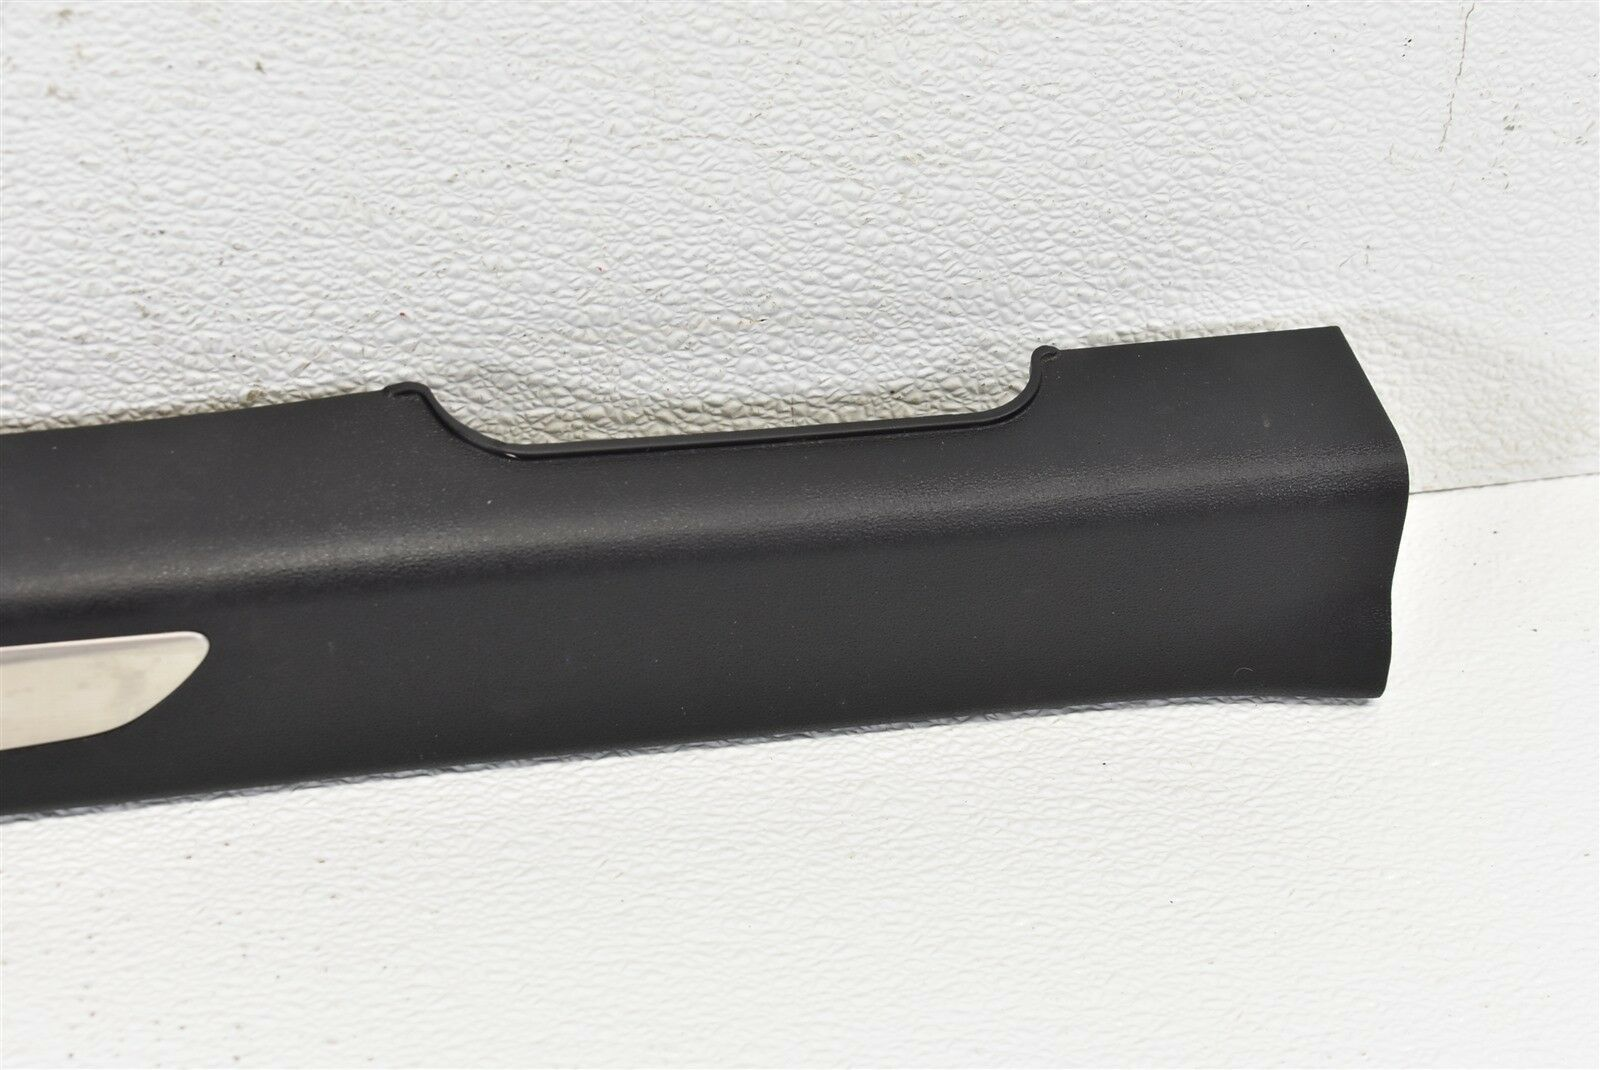 2009-2012 Hyundai Genesis Coupe Right Door Sill Trim Cover Passenger RH 09-12